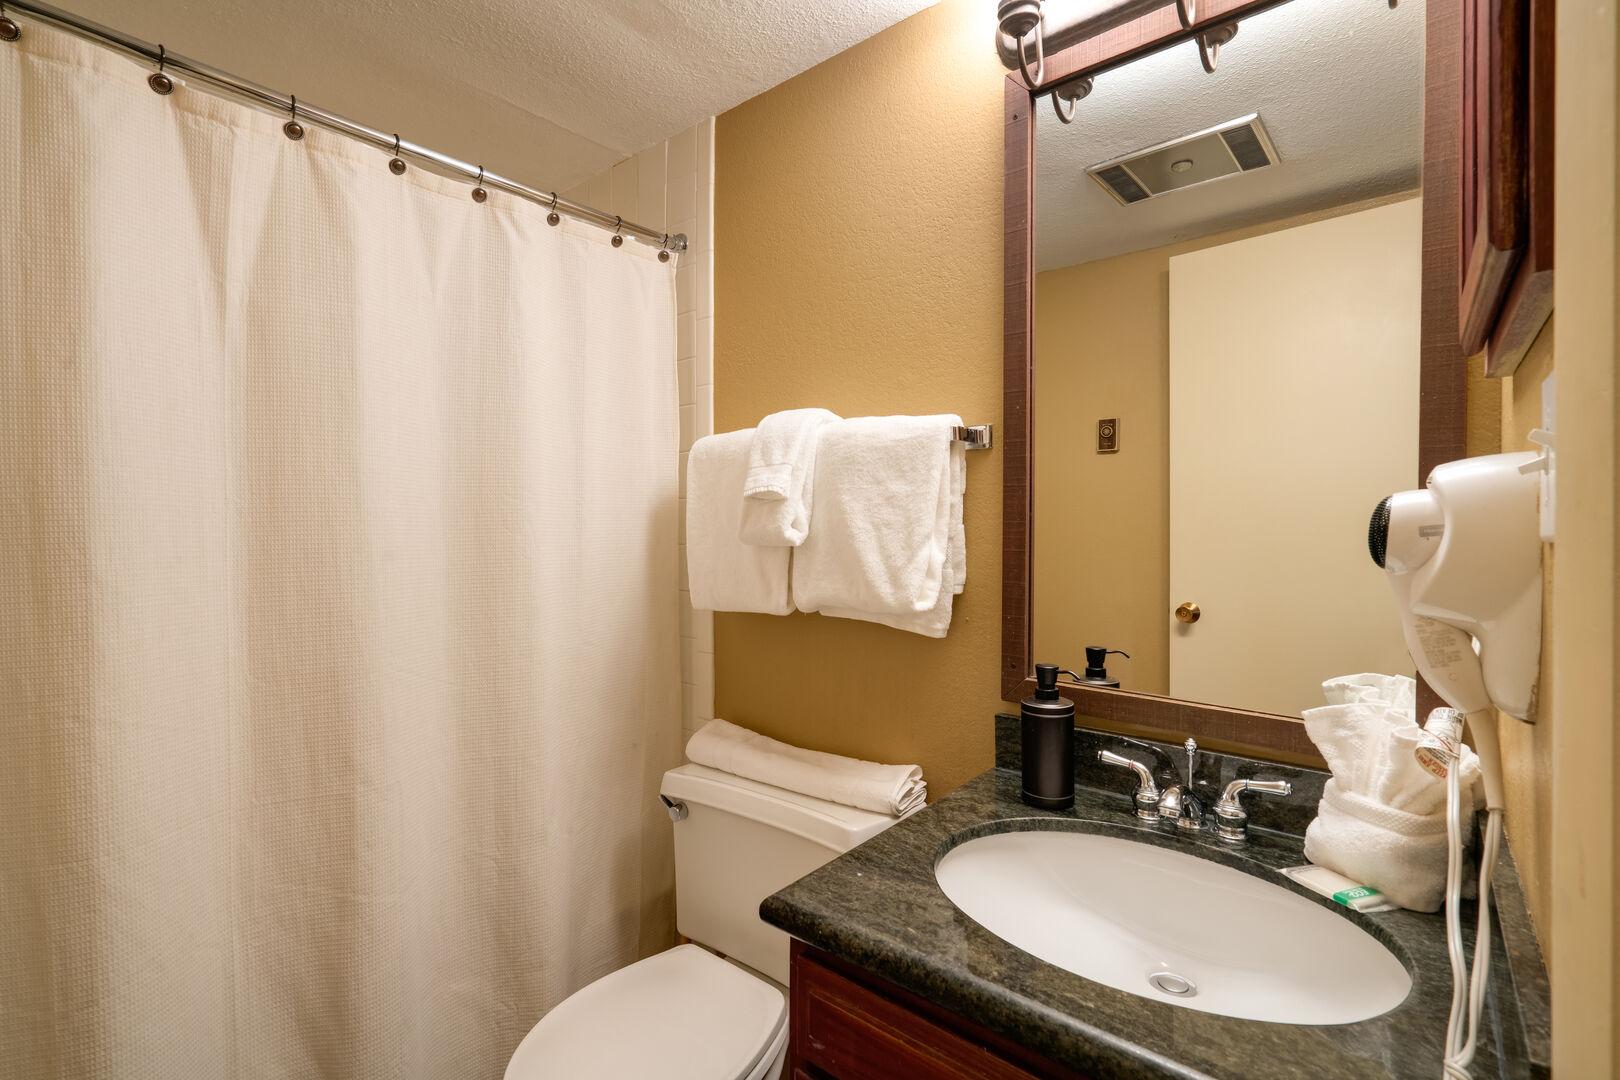 Second bathroom, tub/shower combo